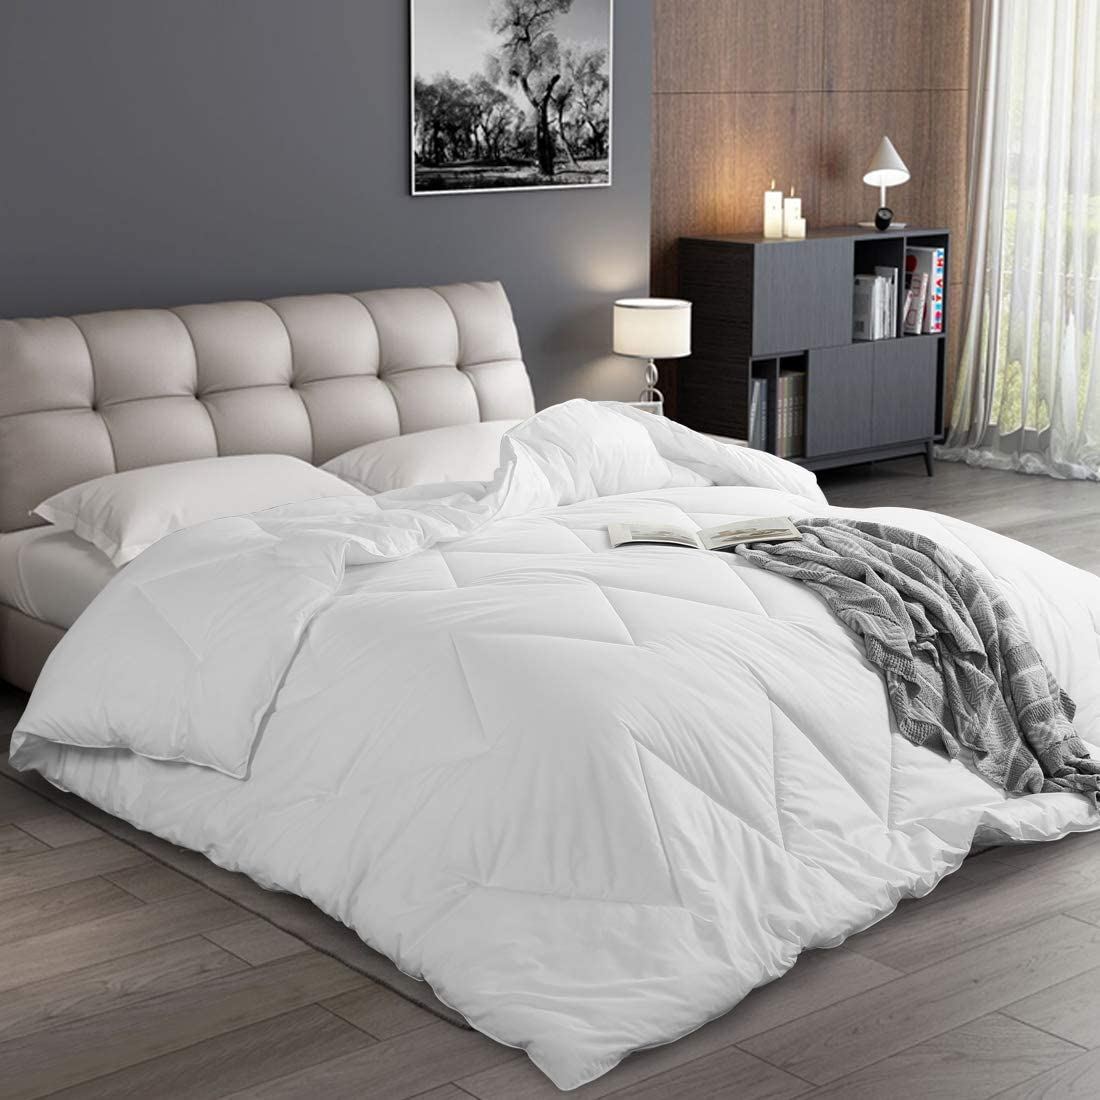 Abakan Luxury Down Alternative Comforter Twin Size 100% Cotton Soft Bedding Summer Comforter Lightweight Hypo-allergenic Hotel Duvet Insert with Corner Tabs 64x88 inch White